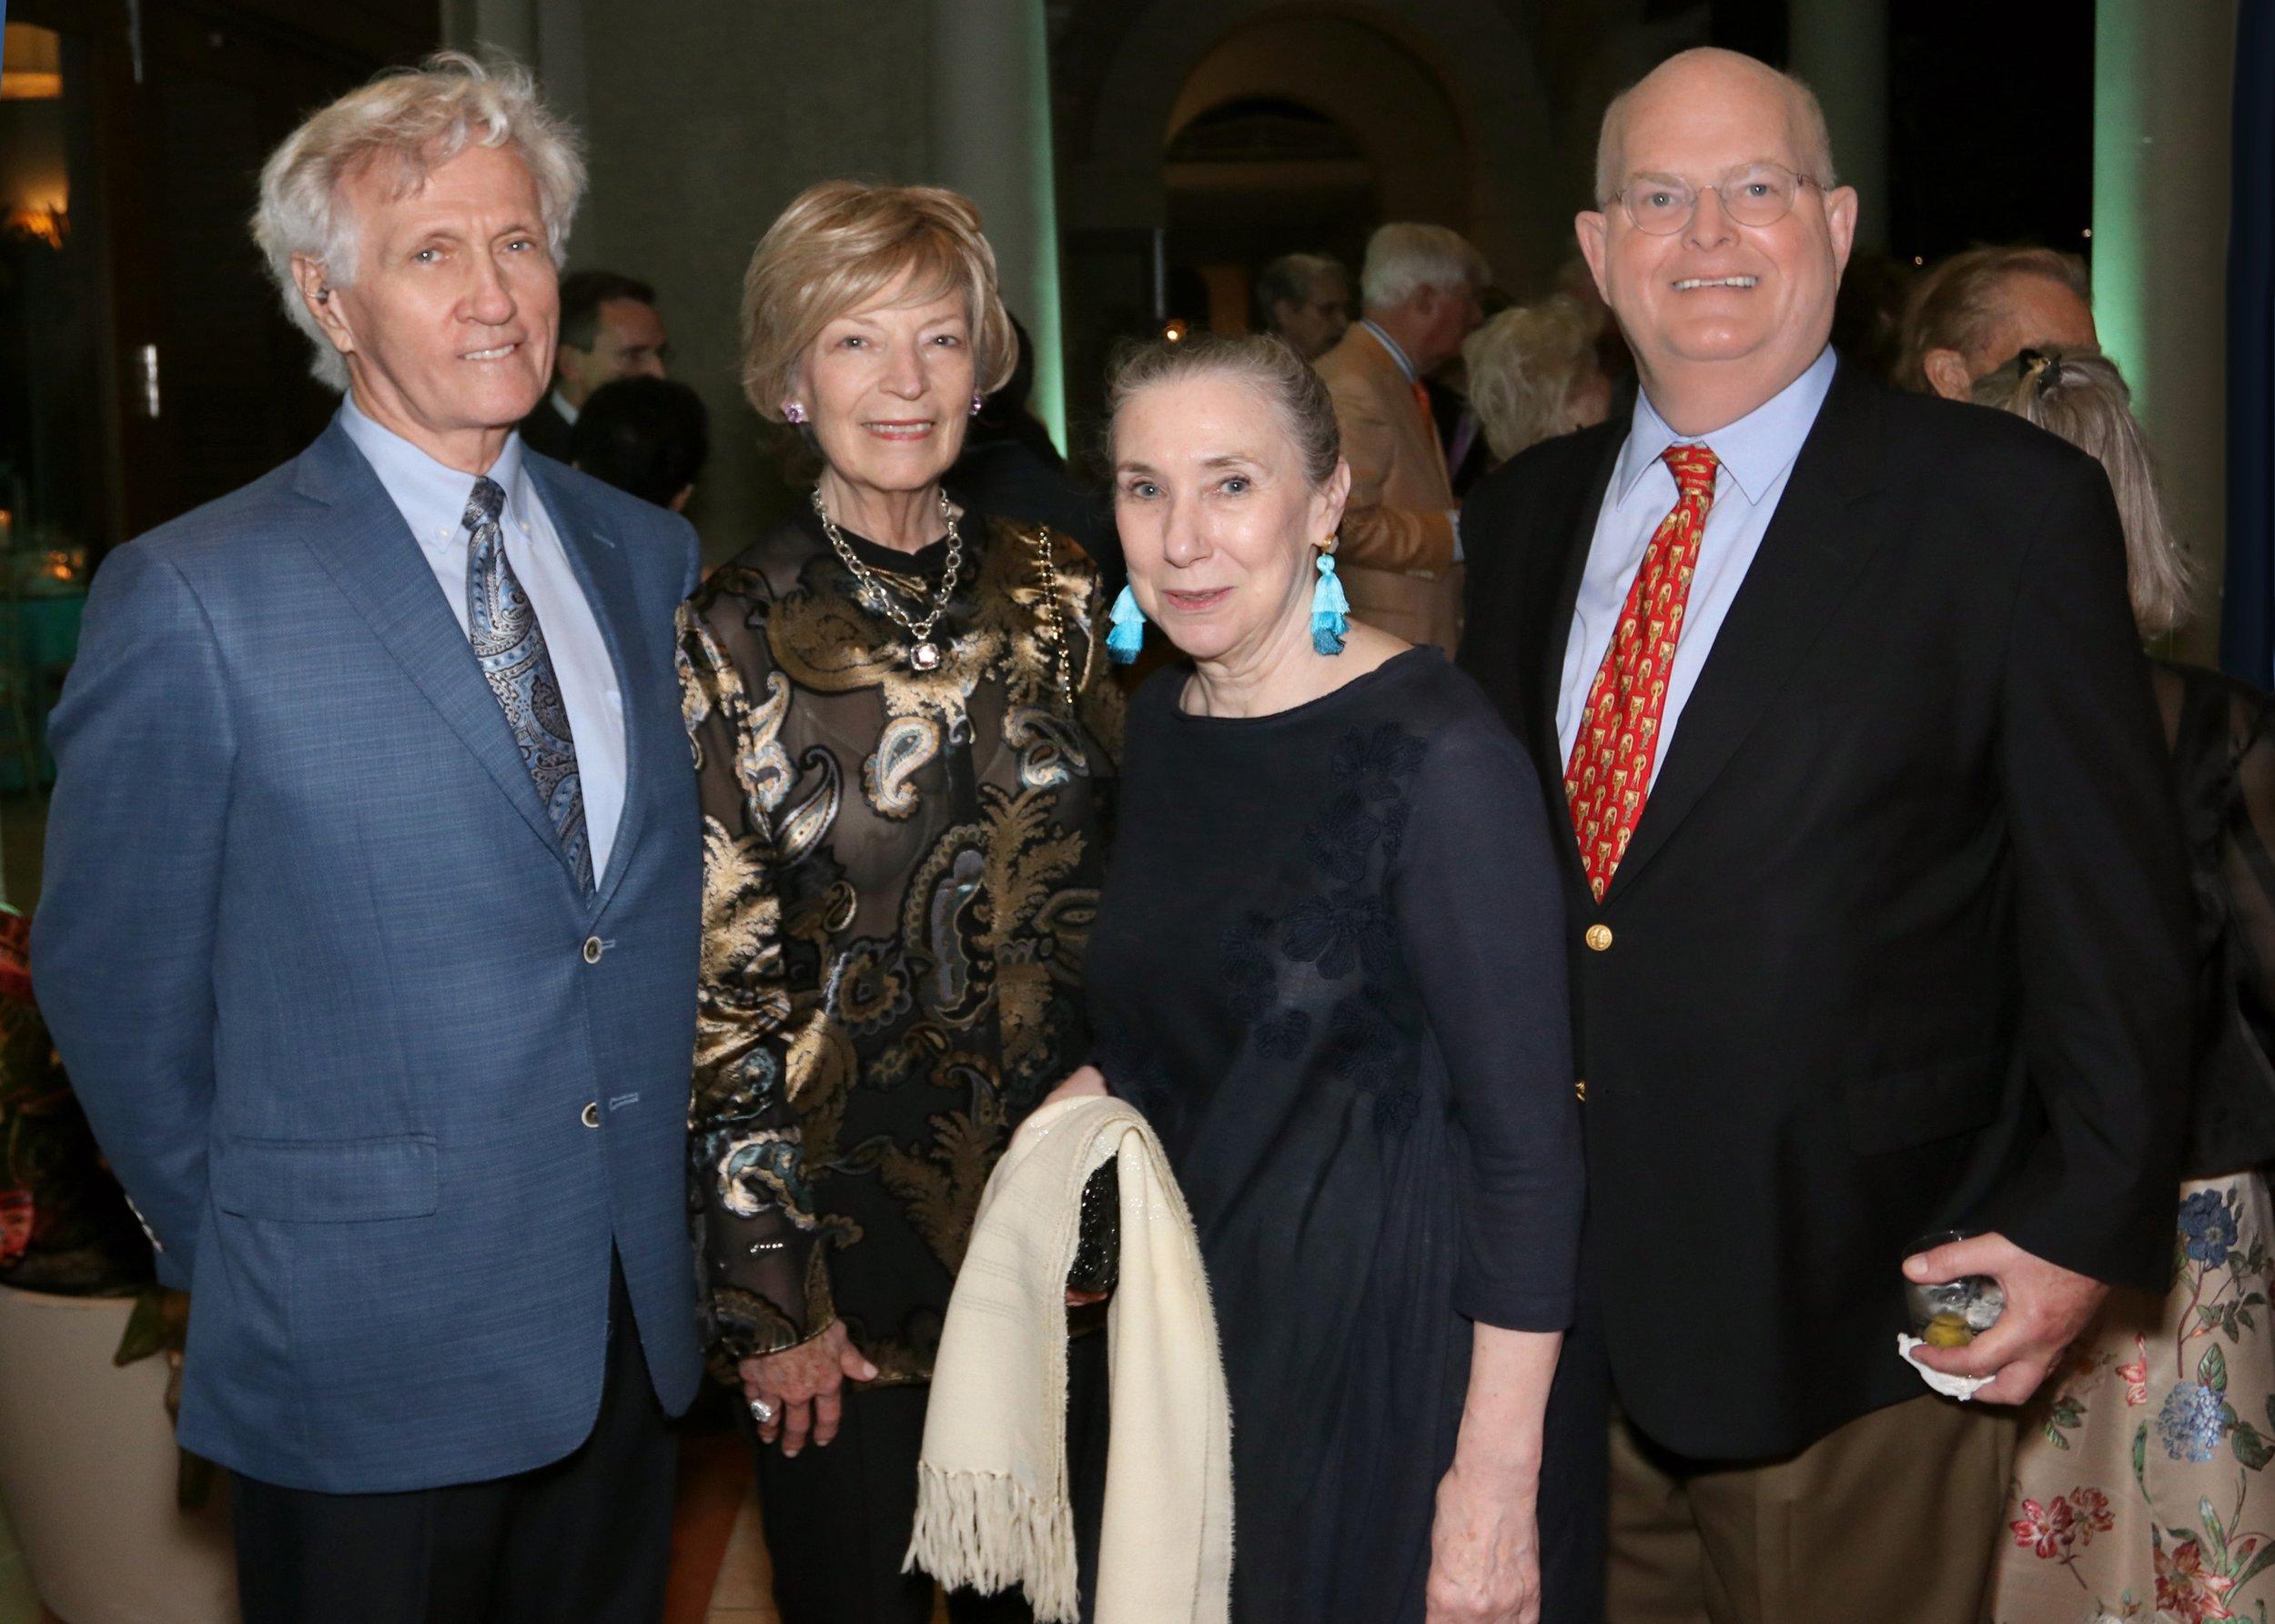 Len Clark, Margaret MacKenzie, Joan Rosasco, Marc Meadows